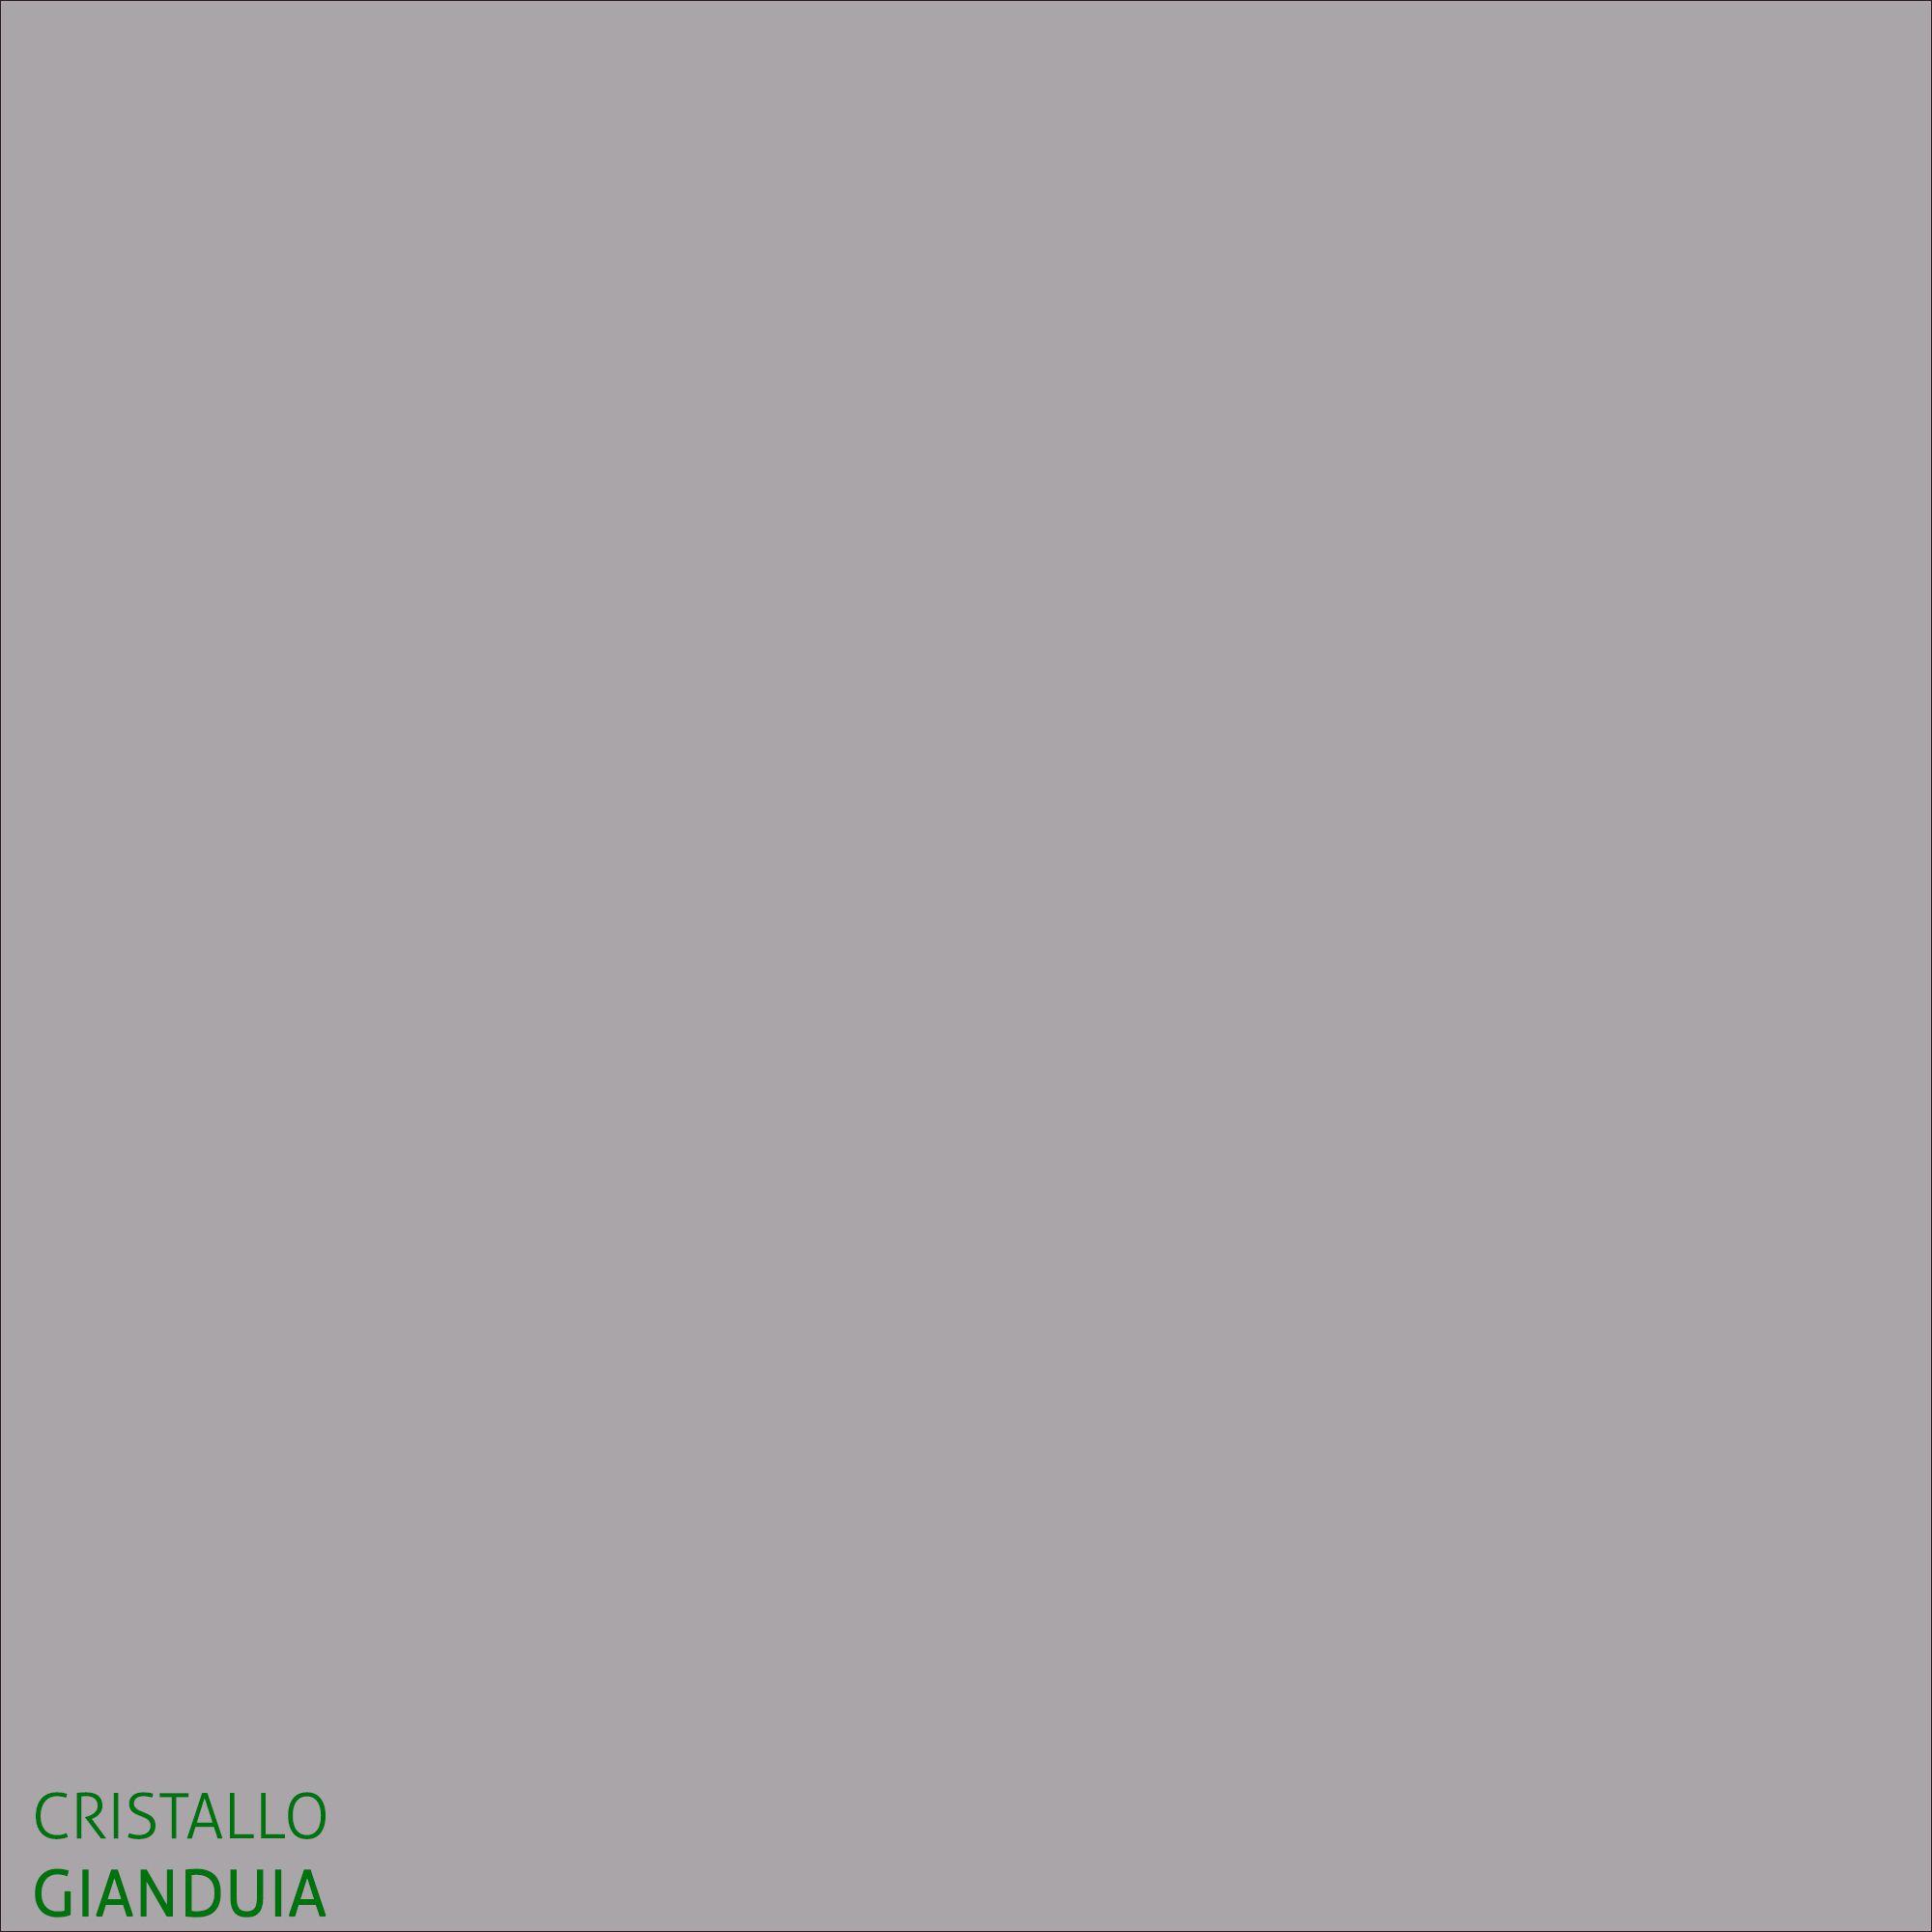 MDF Cristallo Gianduia 2.750 x 1.840 mm Duratex